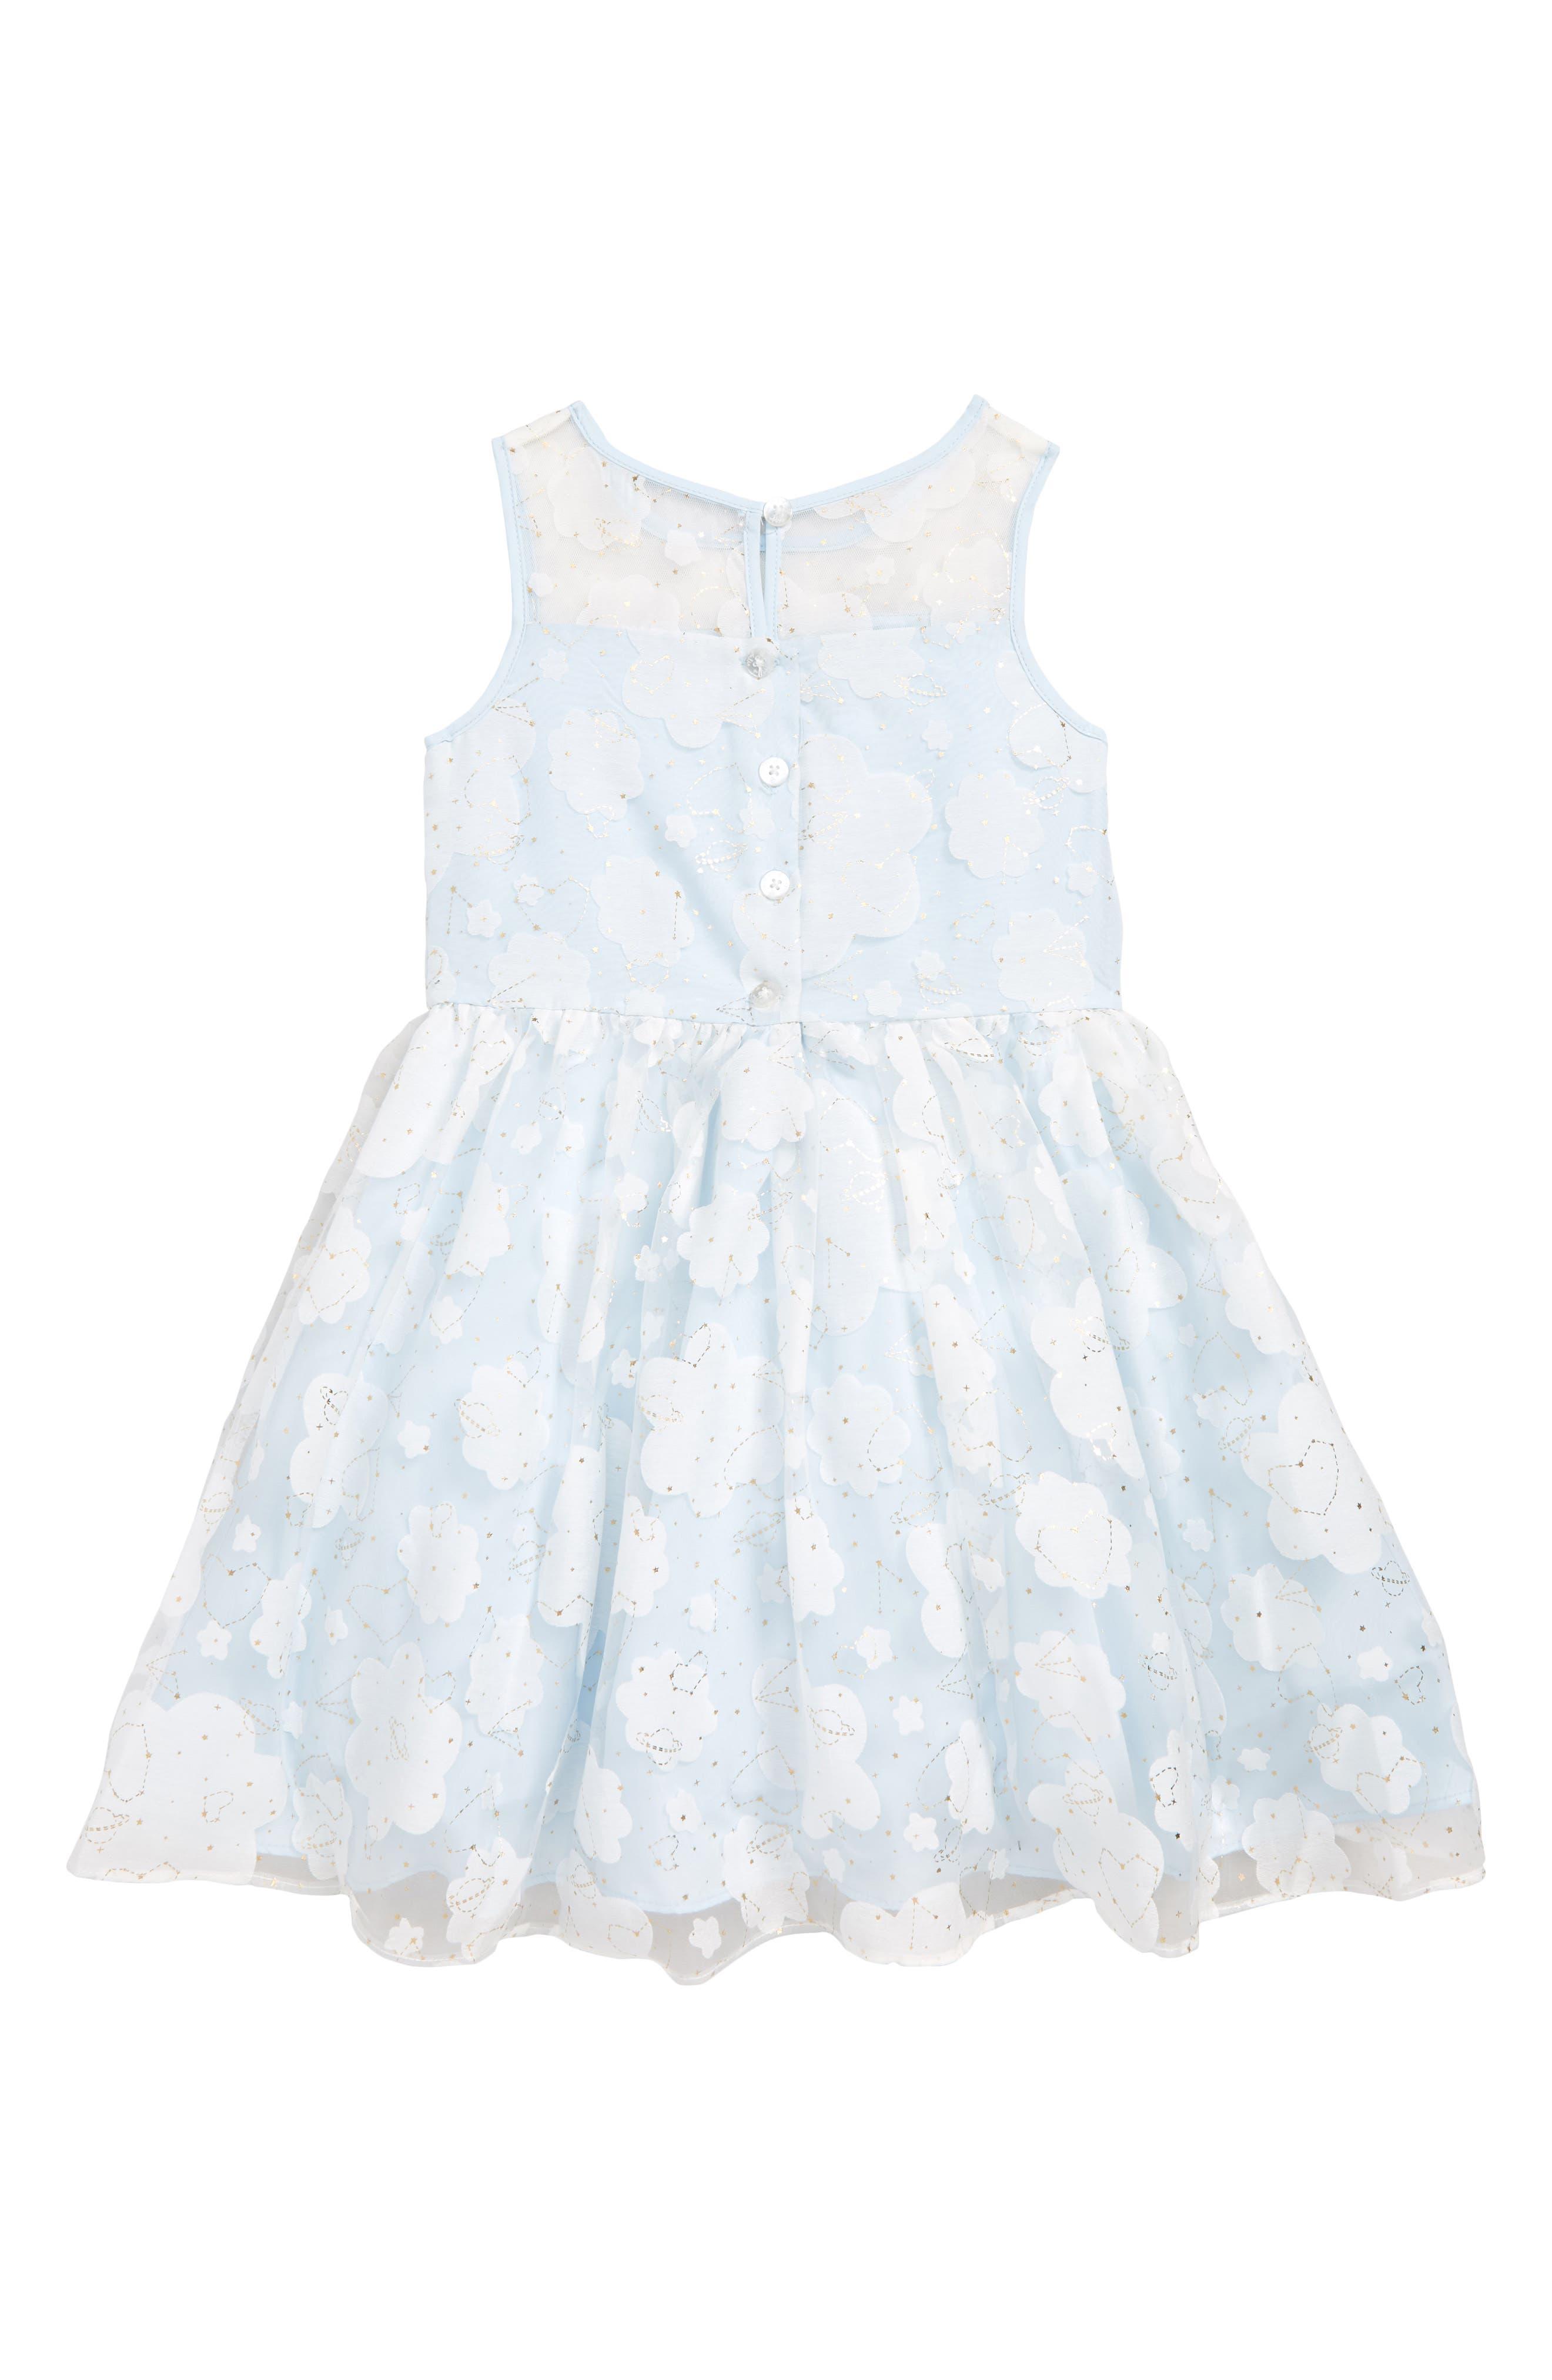 PIPPA & JULIE, Constellation Burnout Dress, Alternate thumbnail 2, color, WHITE/ GOLD